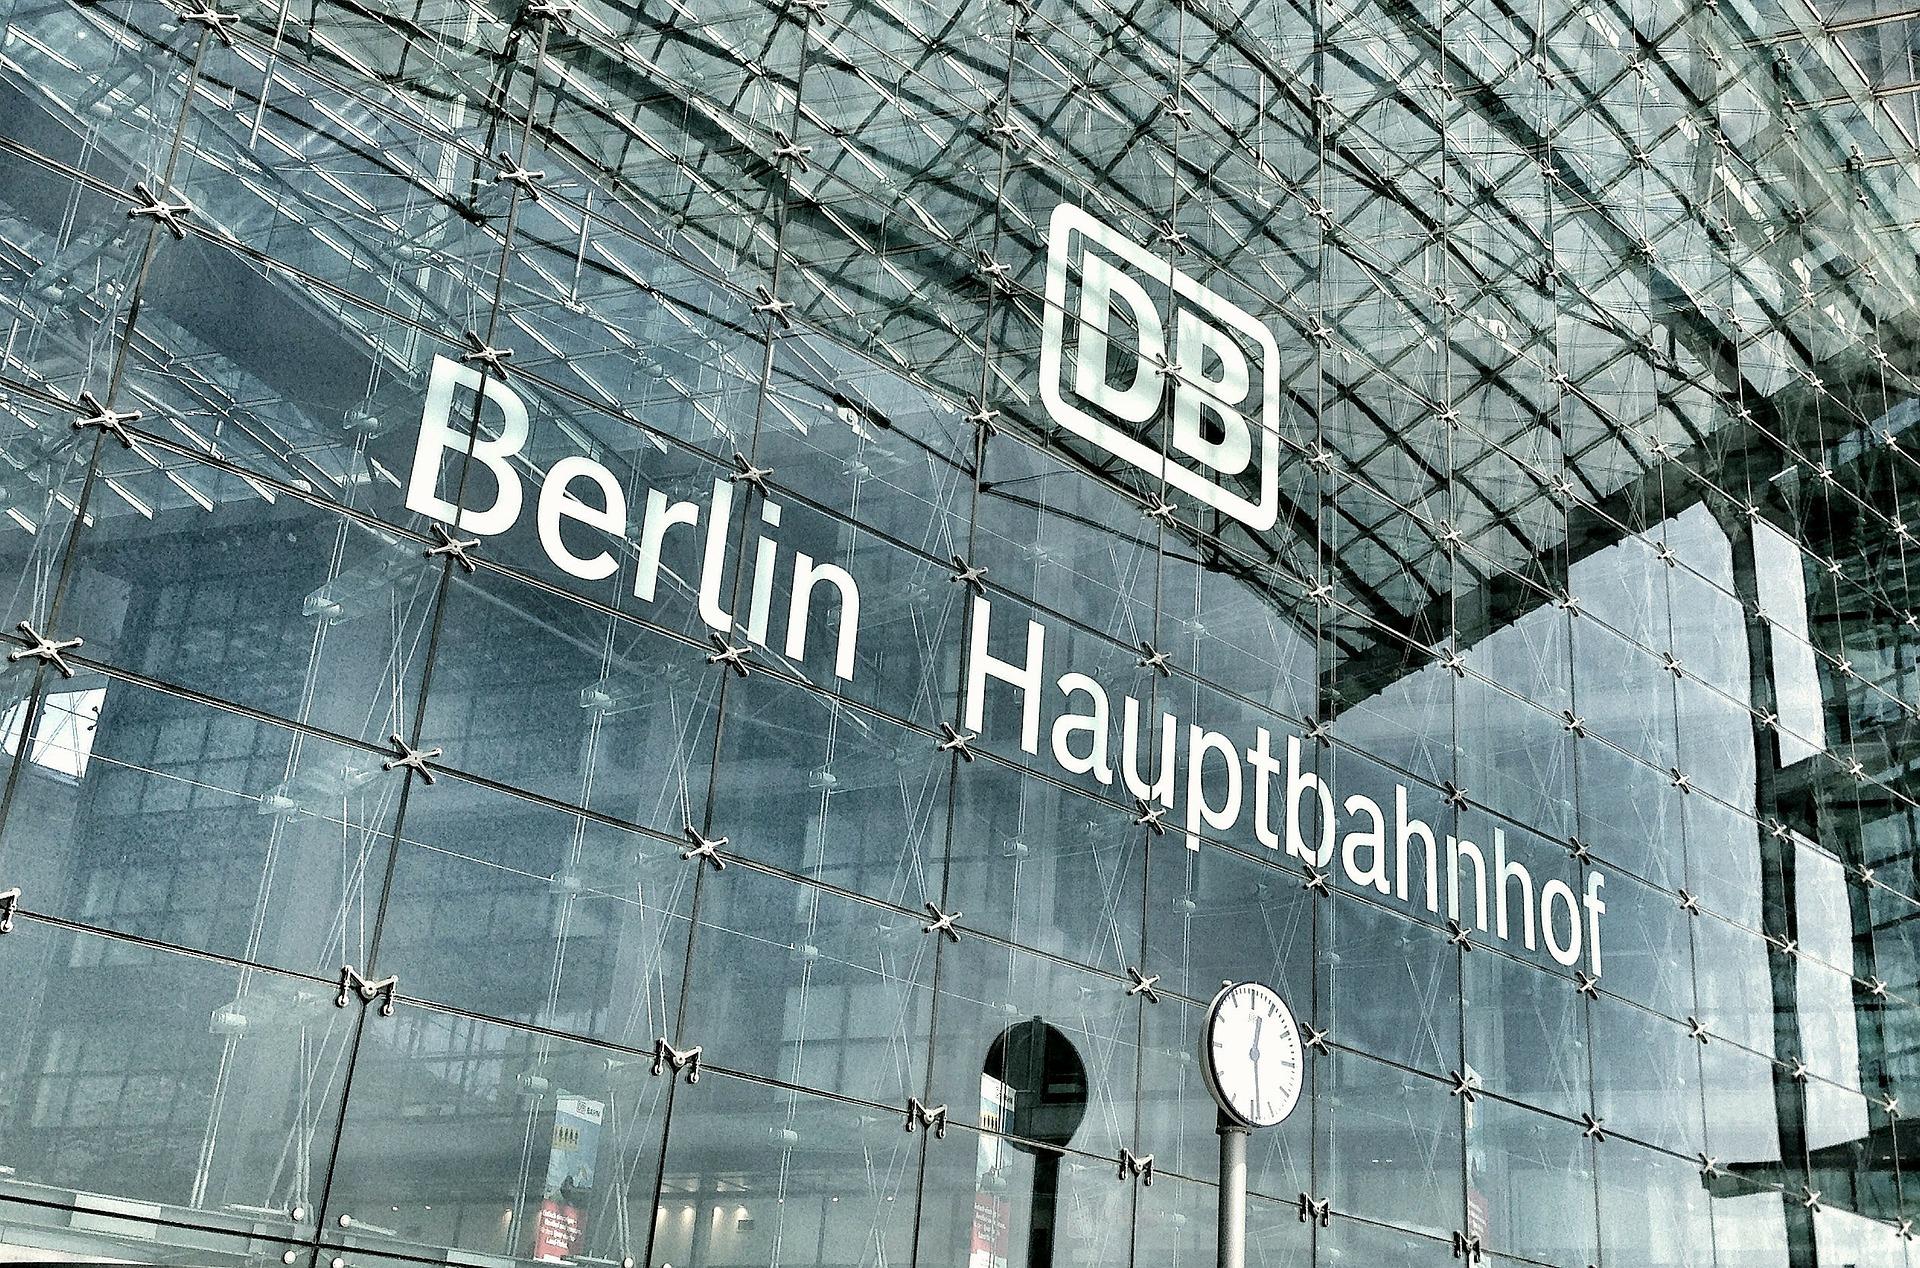 berlin-143835_1920